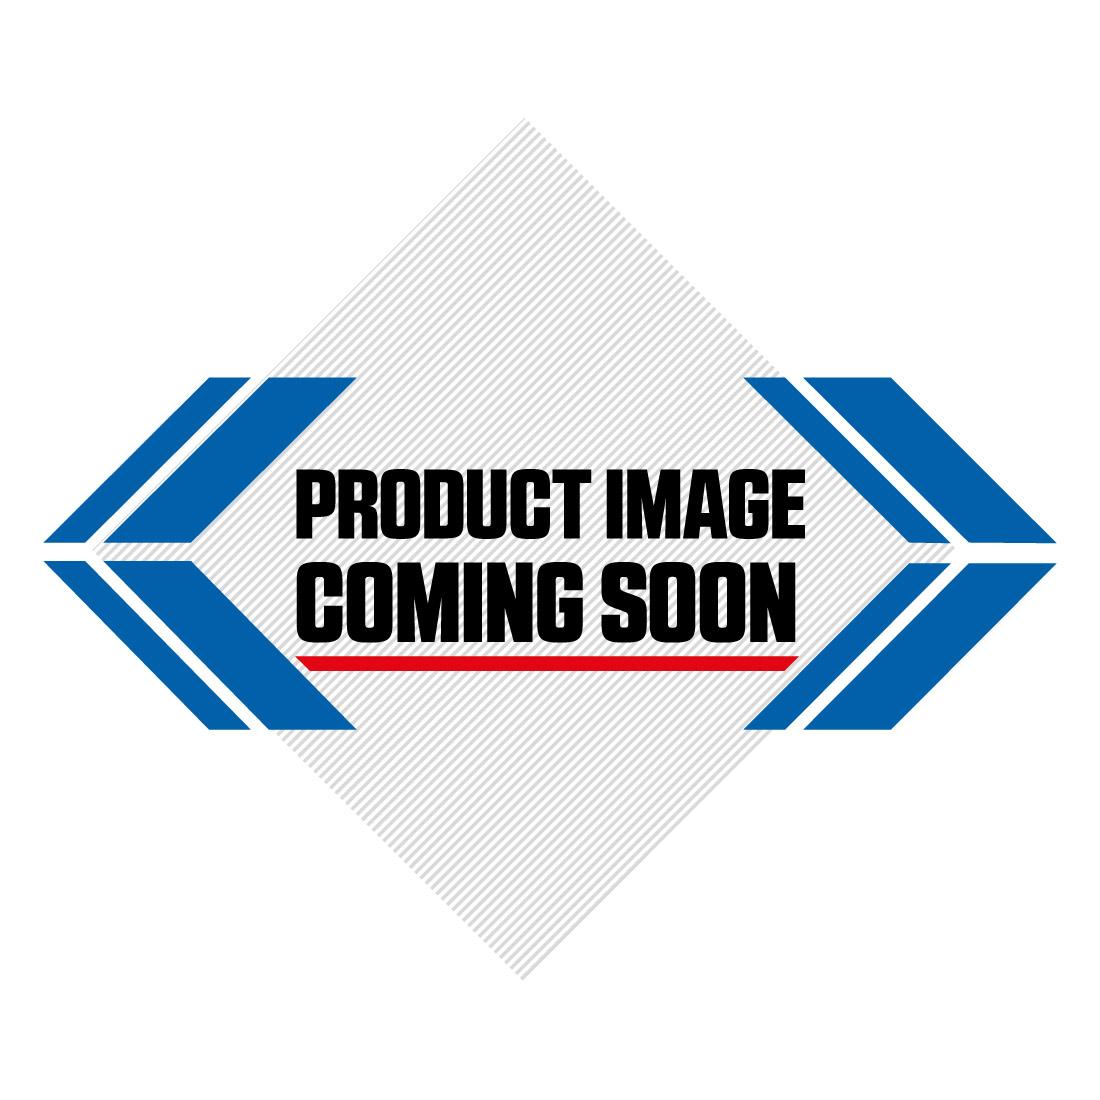 Honda Plastic Kit CRF 250 (14-17) CRF 450 (13-16) OEM Factory Image-4>